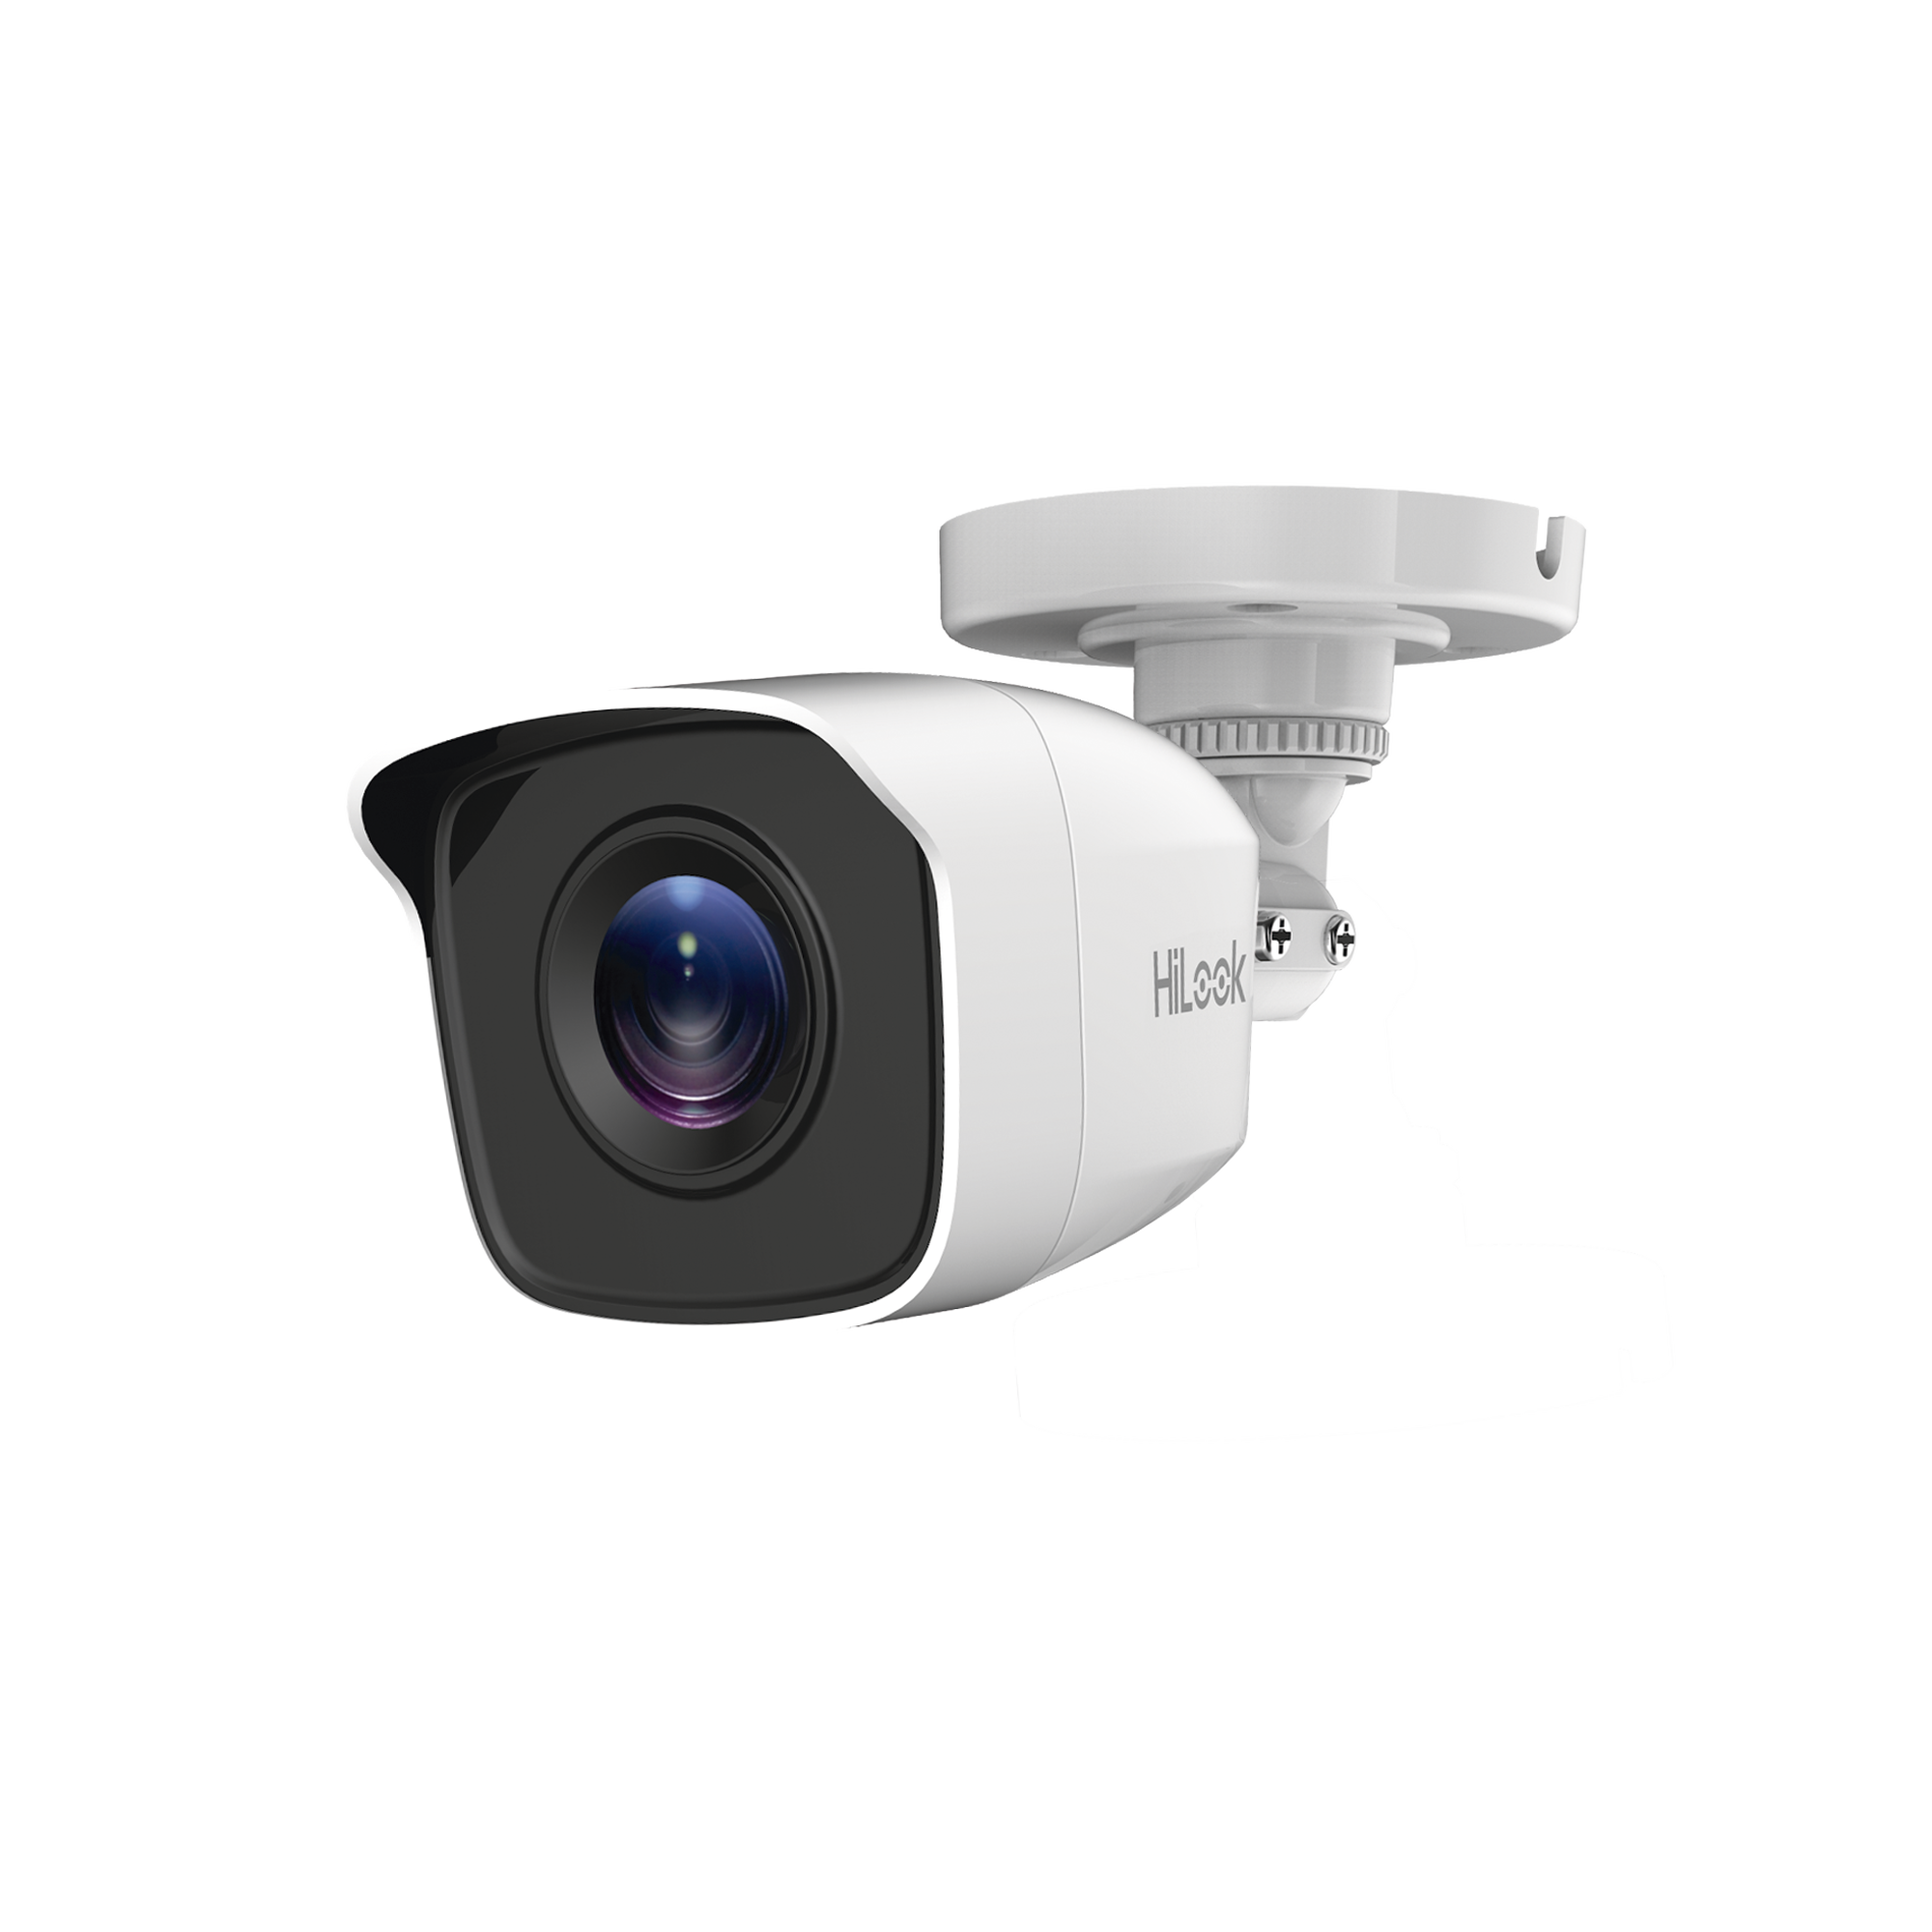 Bala TURBOHD 720p / METAL / Gran Angular 92? / Lente 2.8 mm / IR EXIR Inteligente 20 mts / Exterior IP66 / dWDR / TVI-AHD-CVI-CVBS